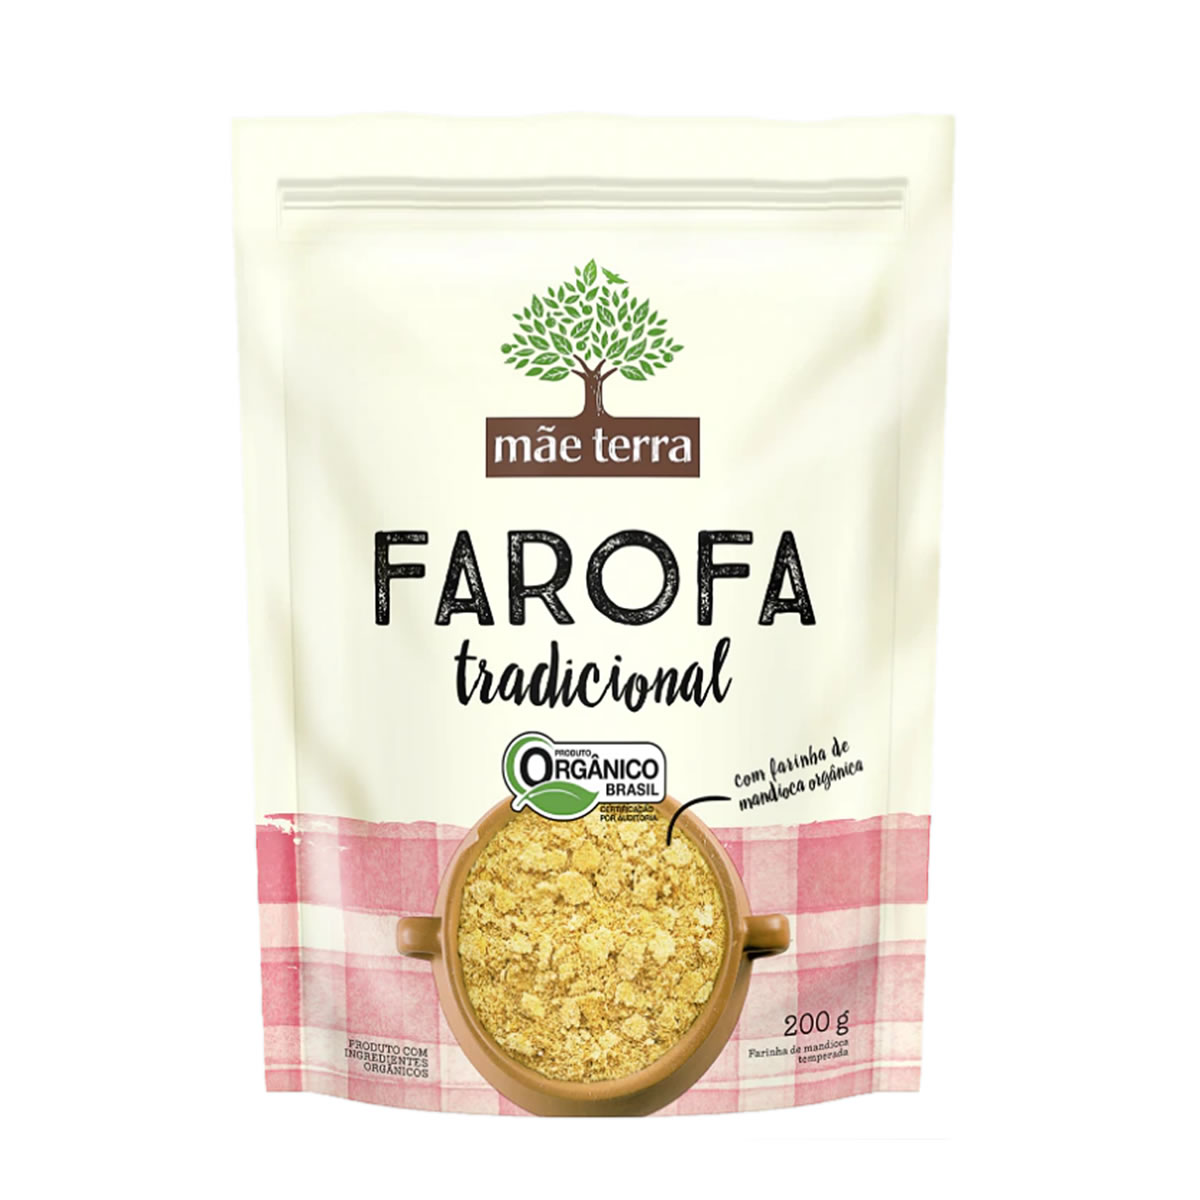 Farofa Tradicional Orgânico 200g  - Mãe Terra